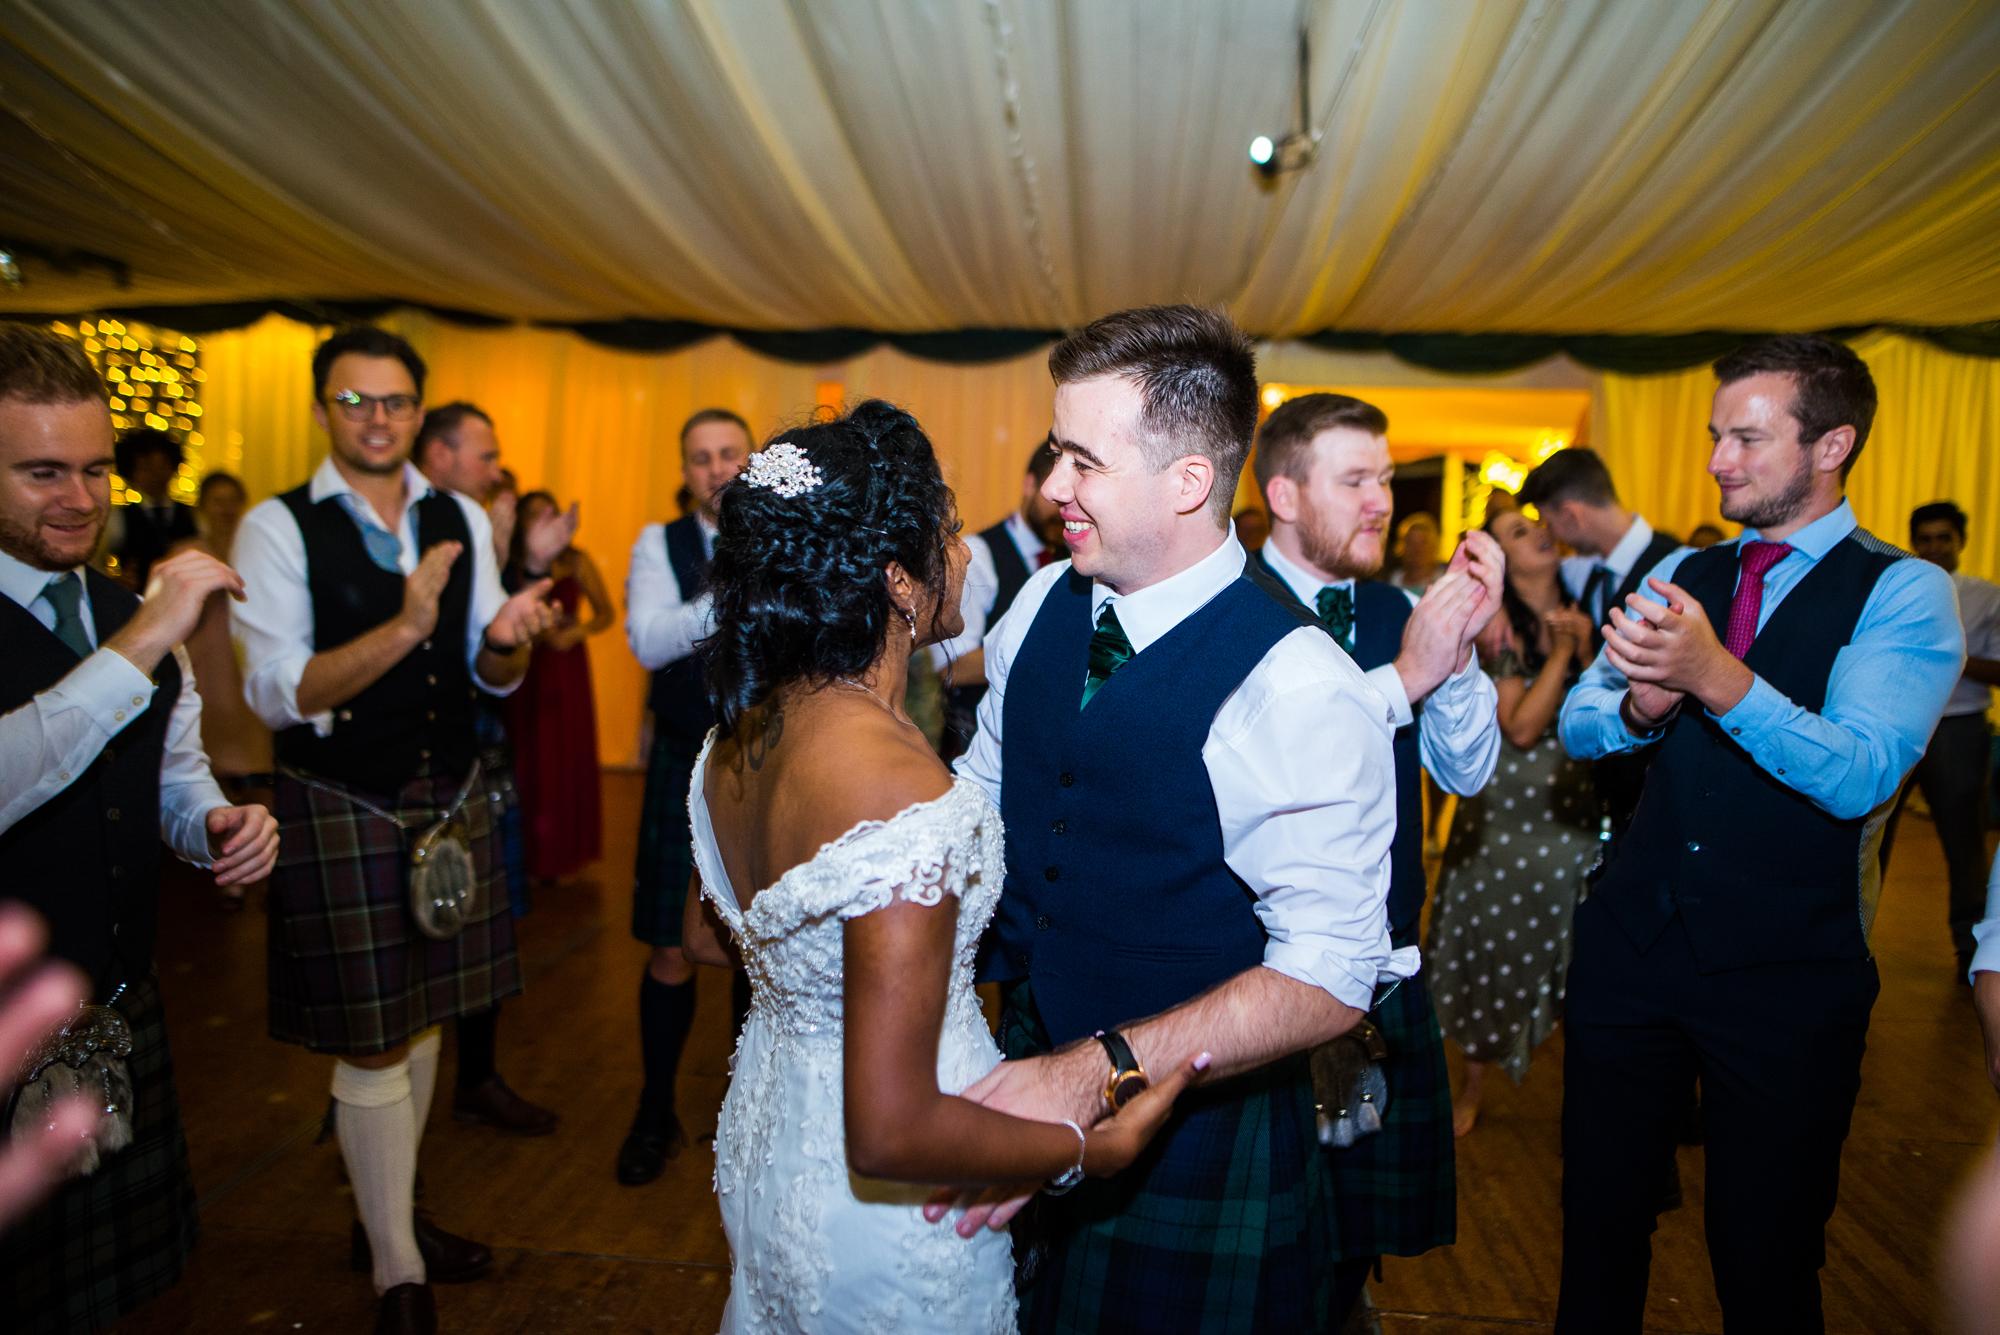 Kev and Shrabani wedding photos (350 of 350).jpg